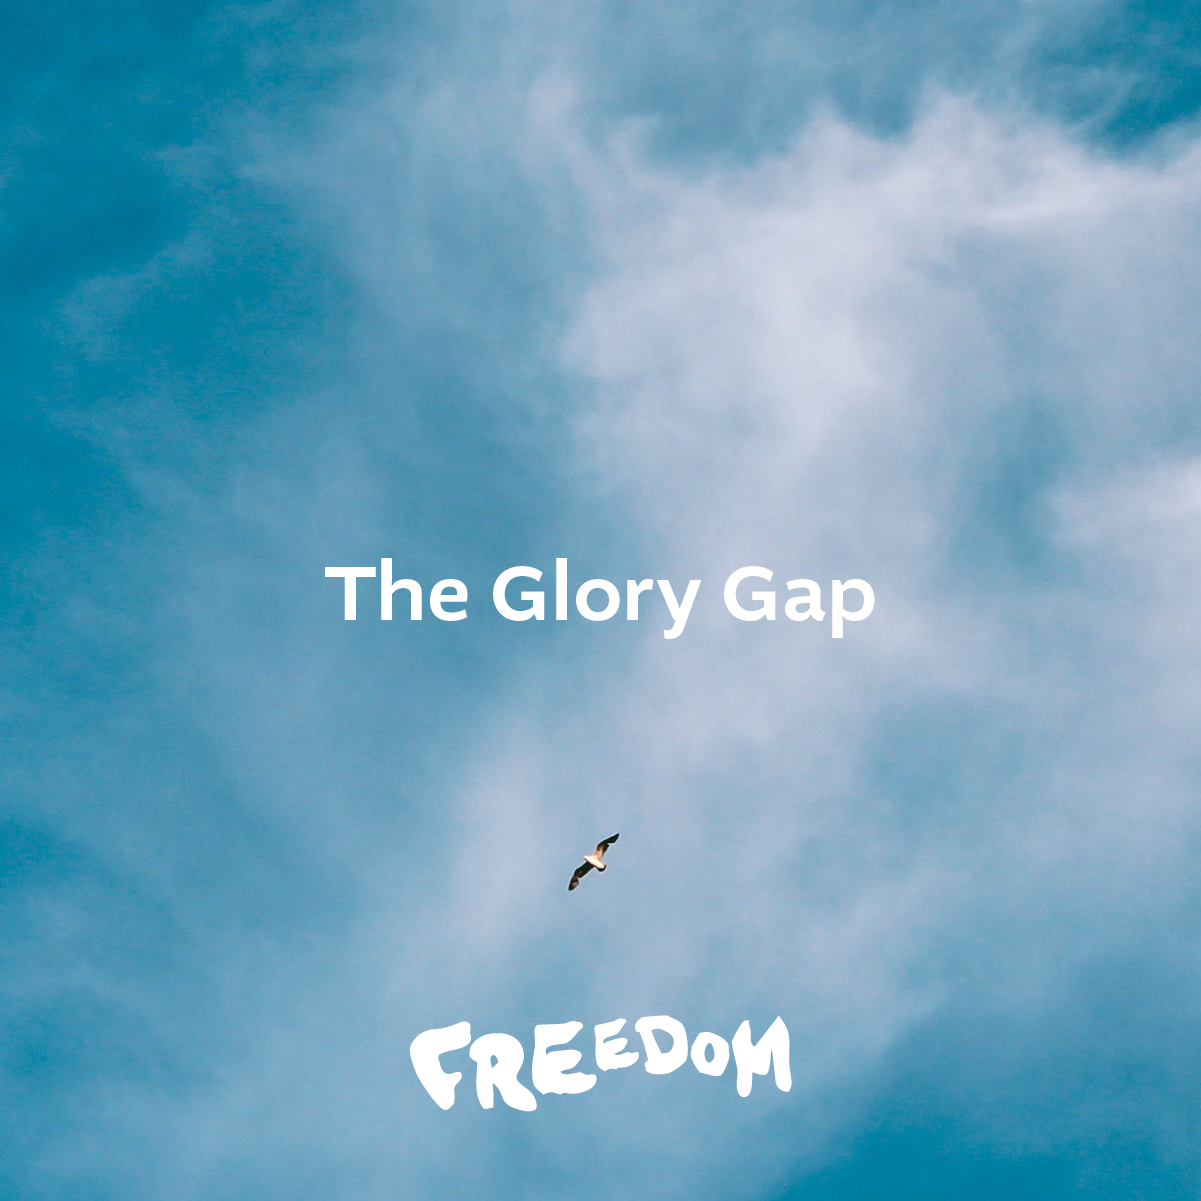 FREEDOM - The Glory Gap